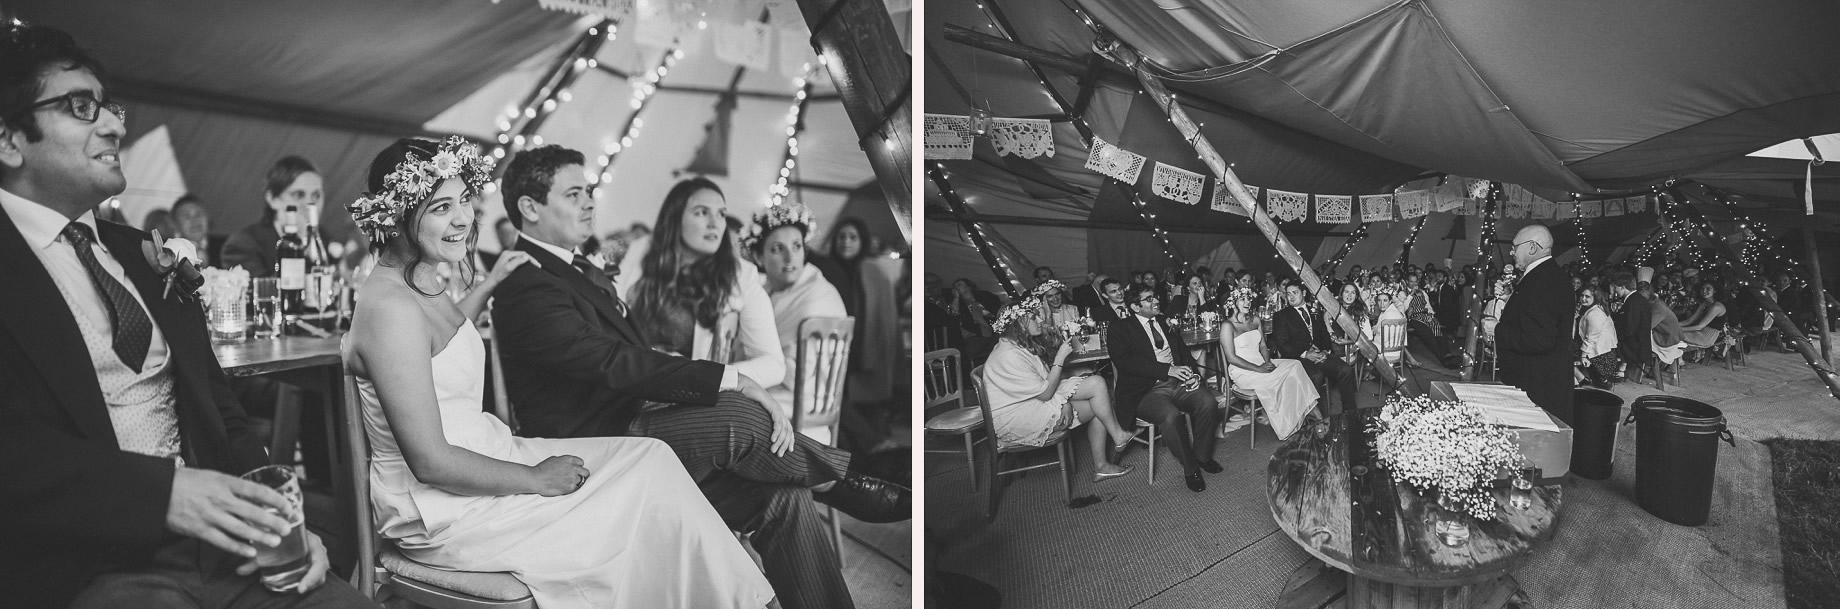 Julia and Simon's Wedding at Yealand Manor 141